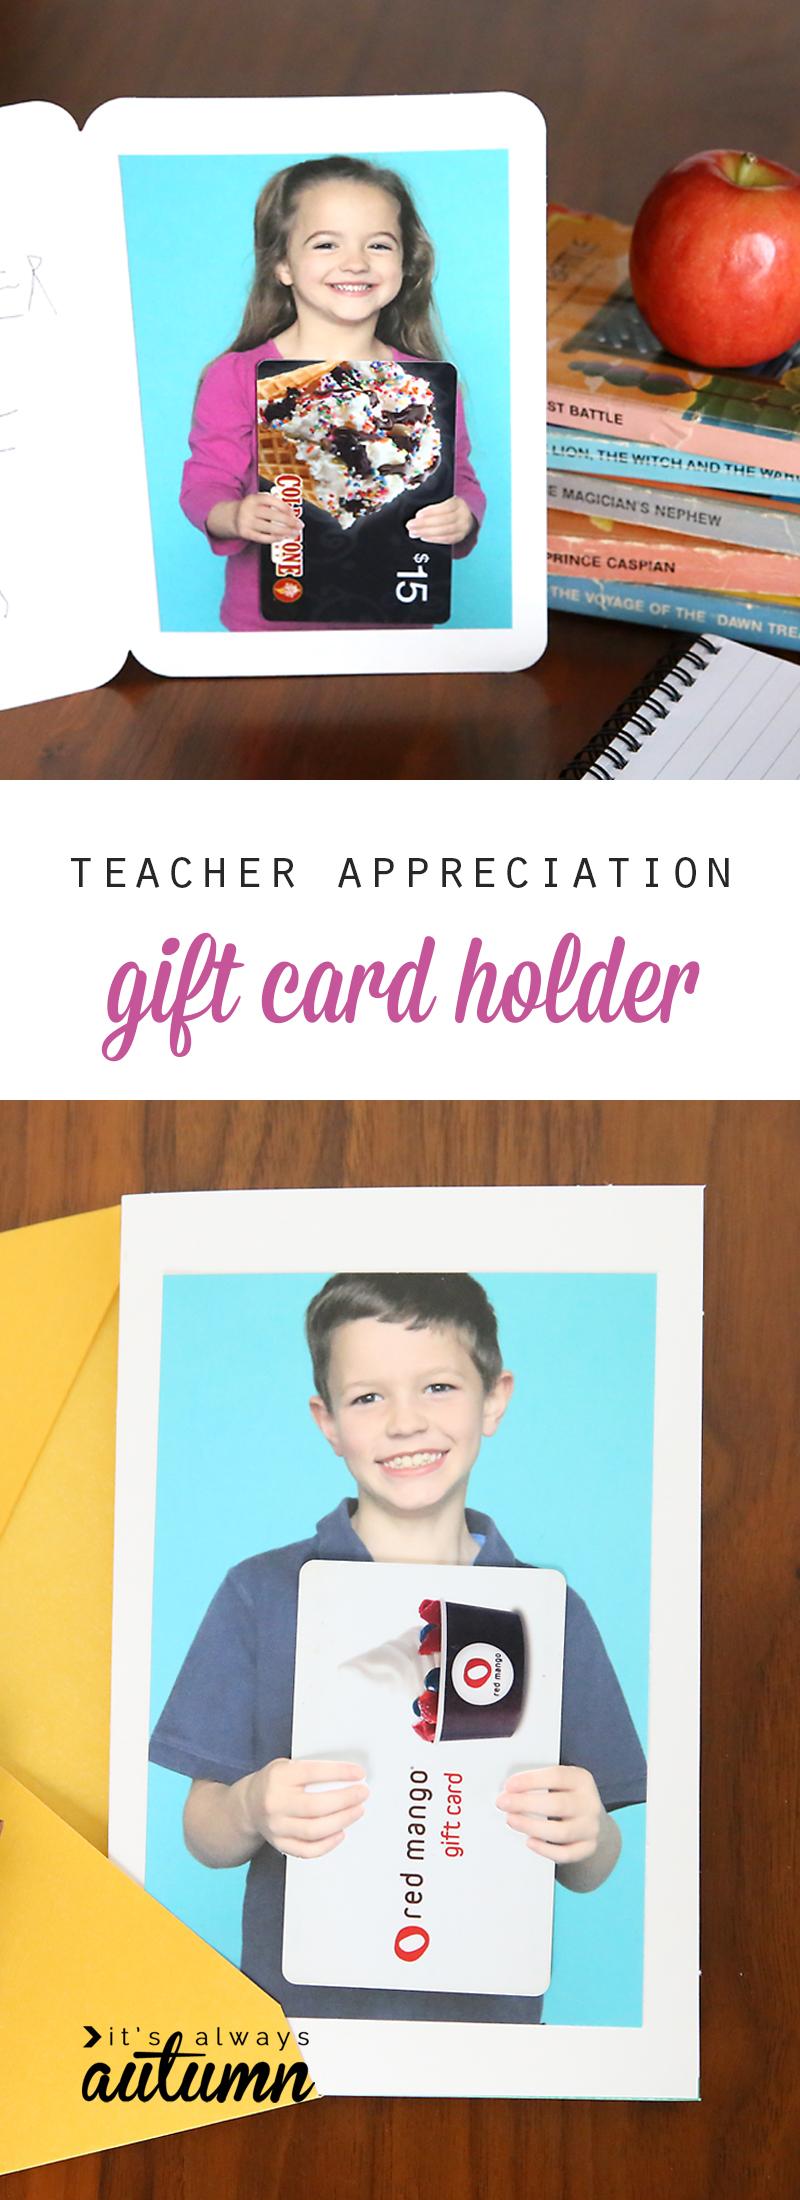 Teacher appreciation photo gift card holder